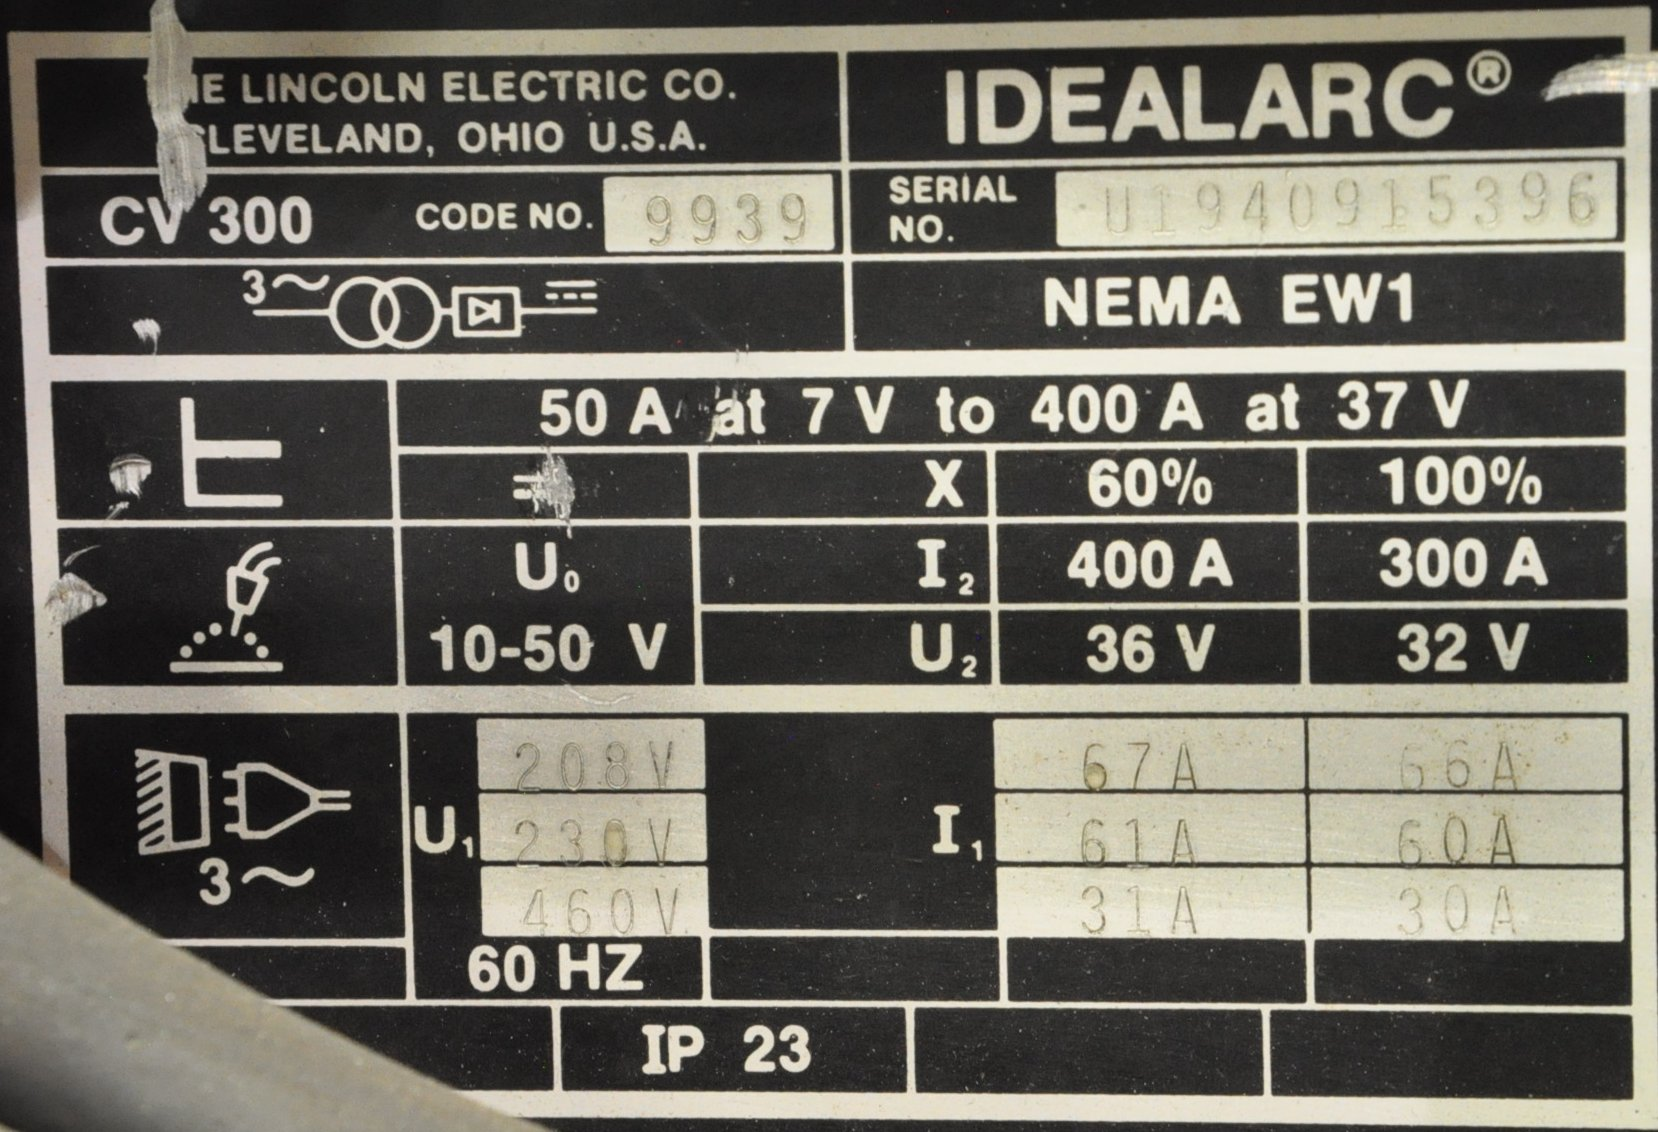 Lincoln Idealarc CV-300, 300-Amp Capacity CV DC Arc Welding - Image 2 of 2